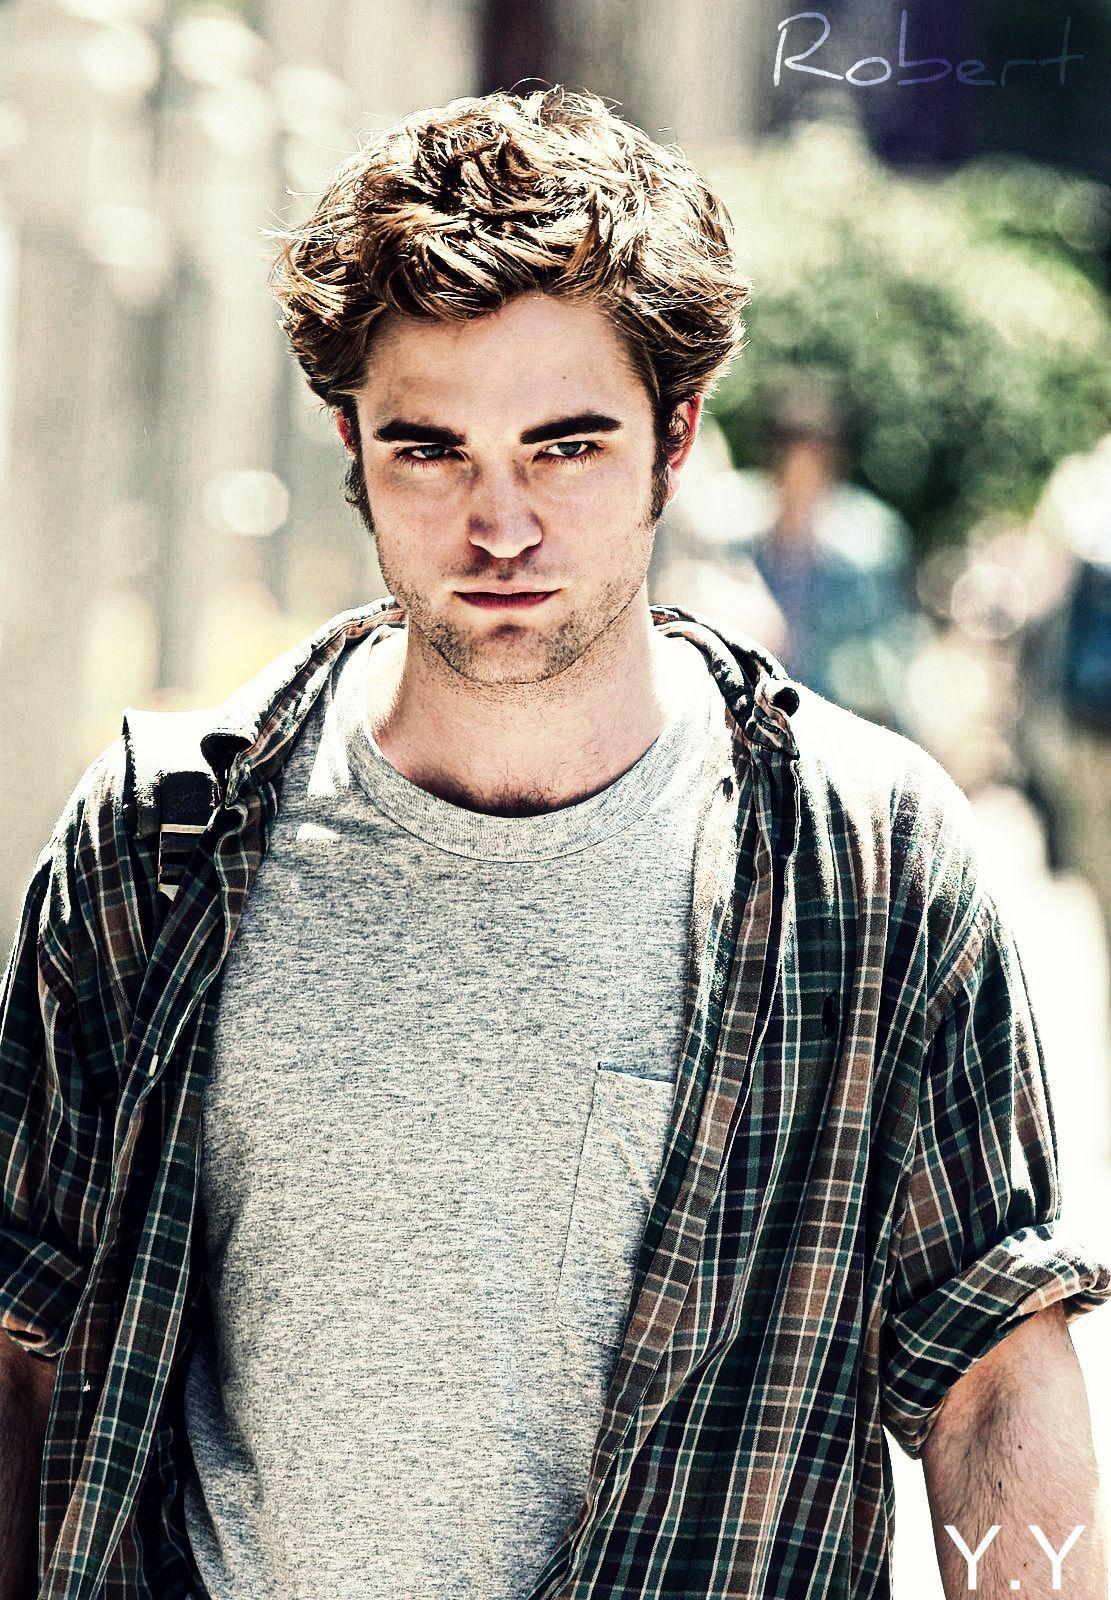 Robert Pattinson Twilight Series Fan Art 6862193 Fanpop